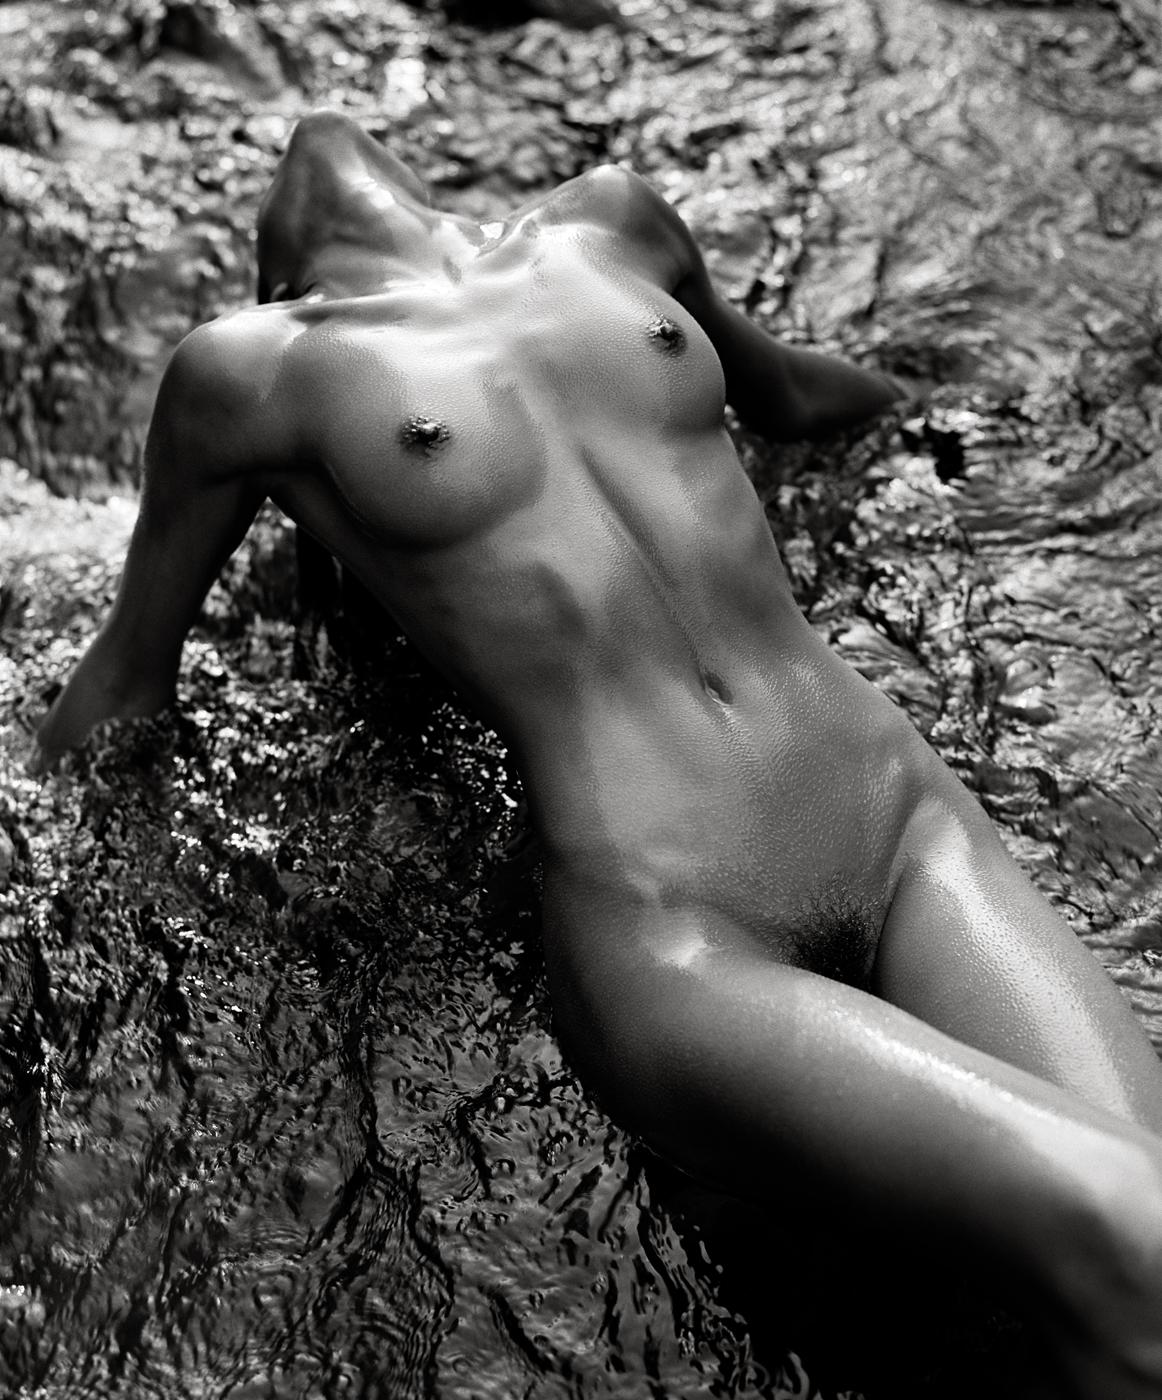 Simone_in_Stream,_Woodland_Valley,_1992.jpg